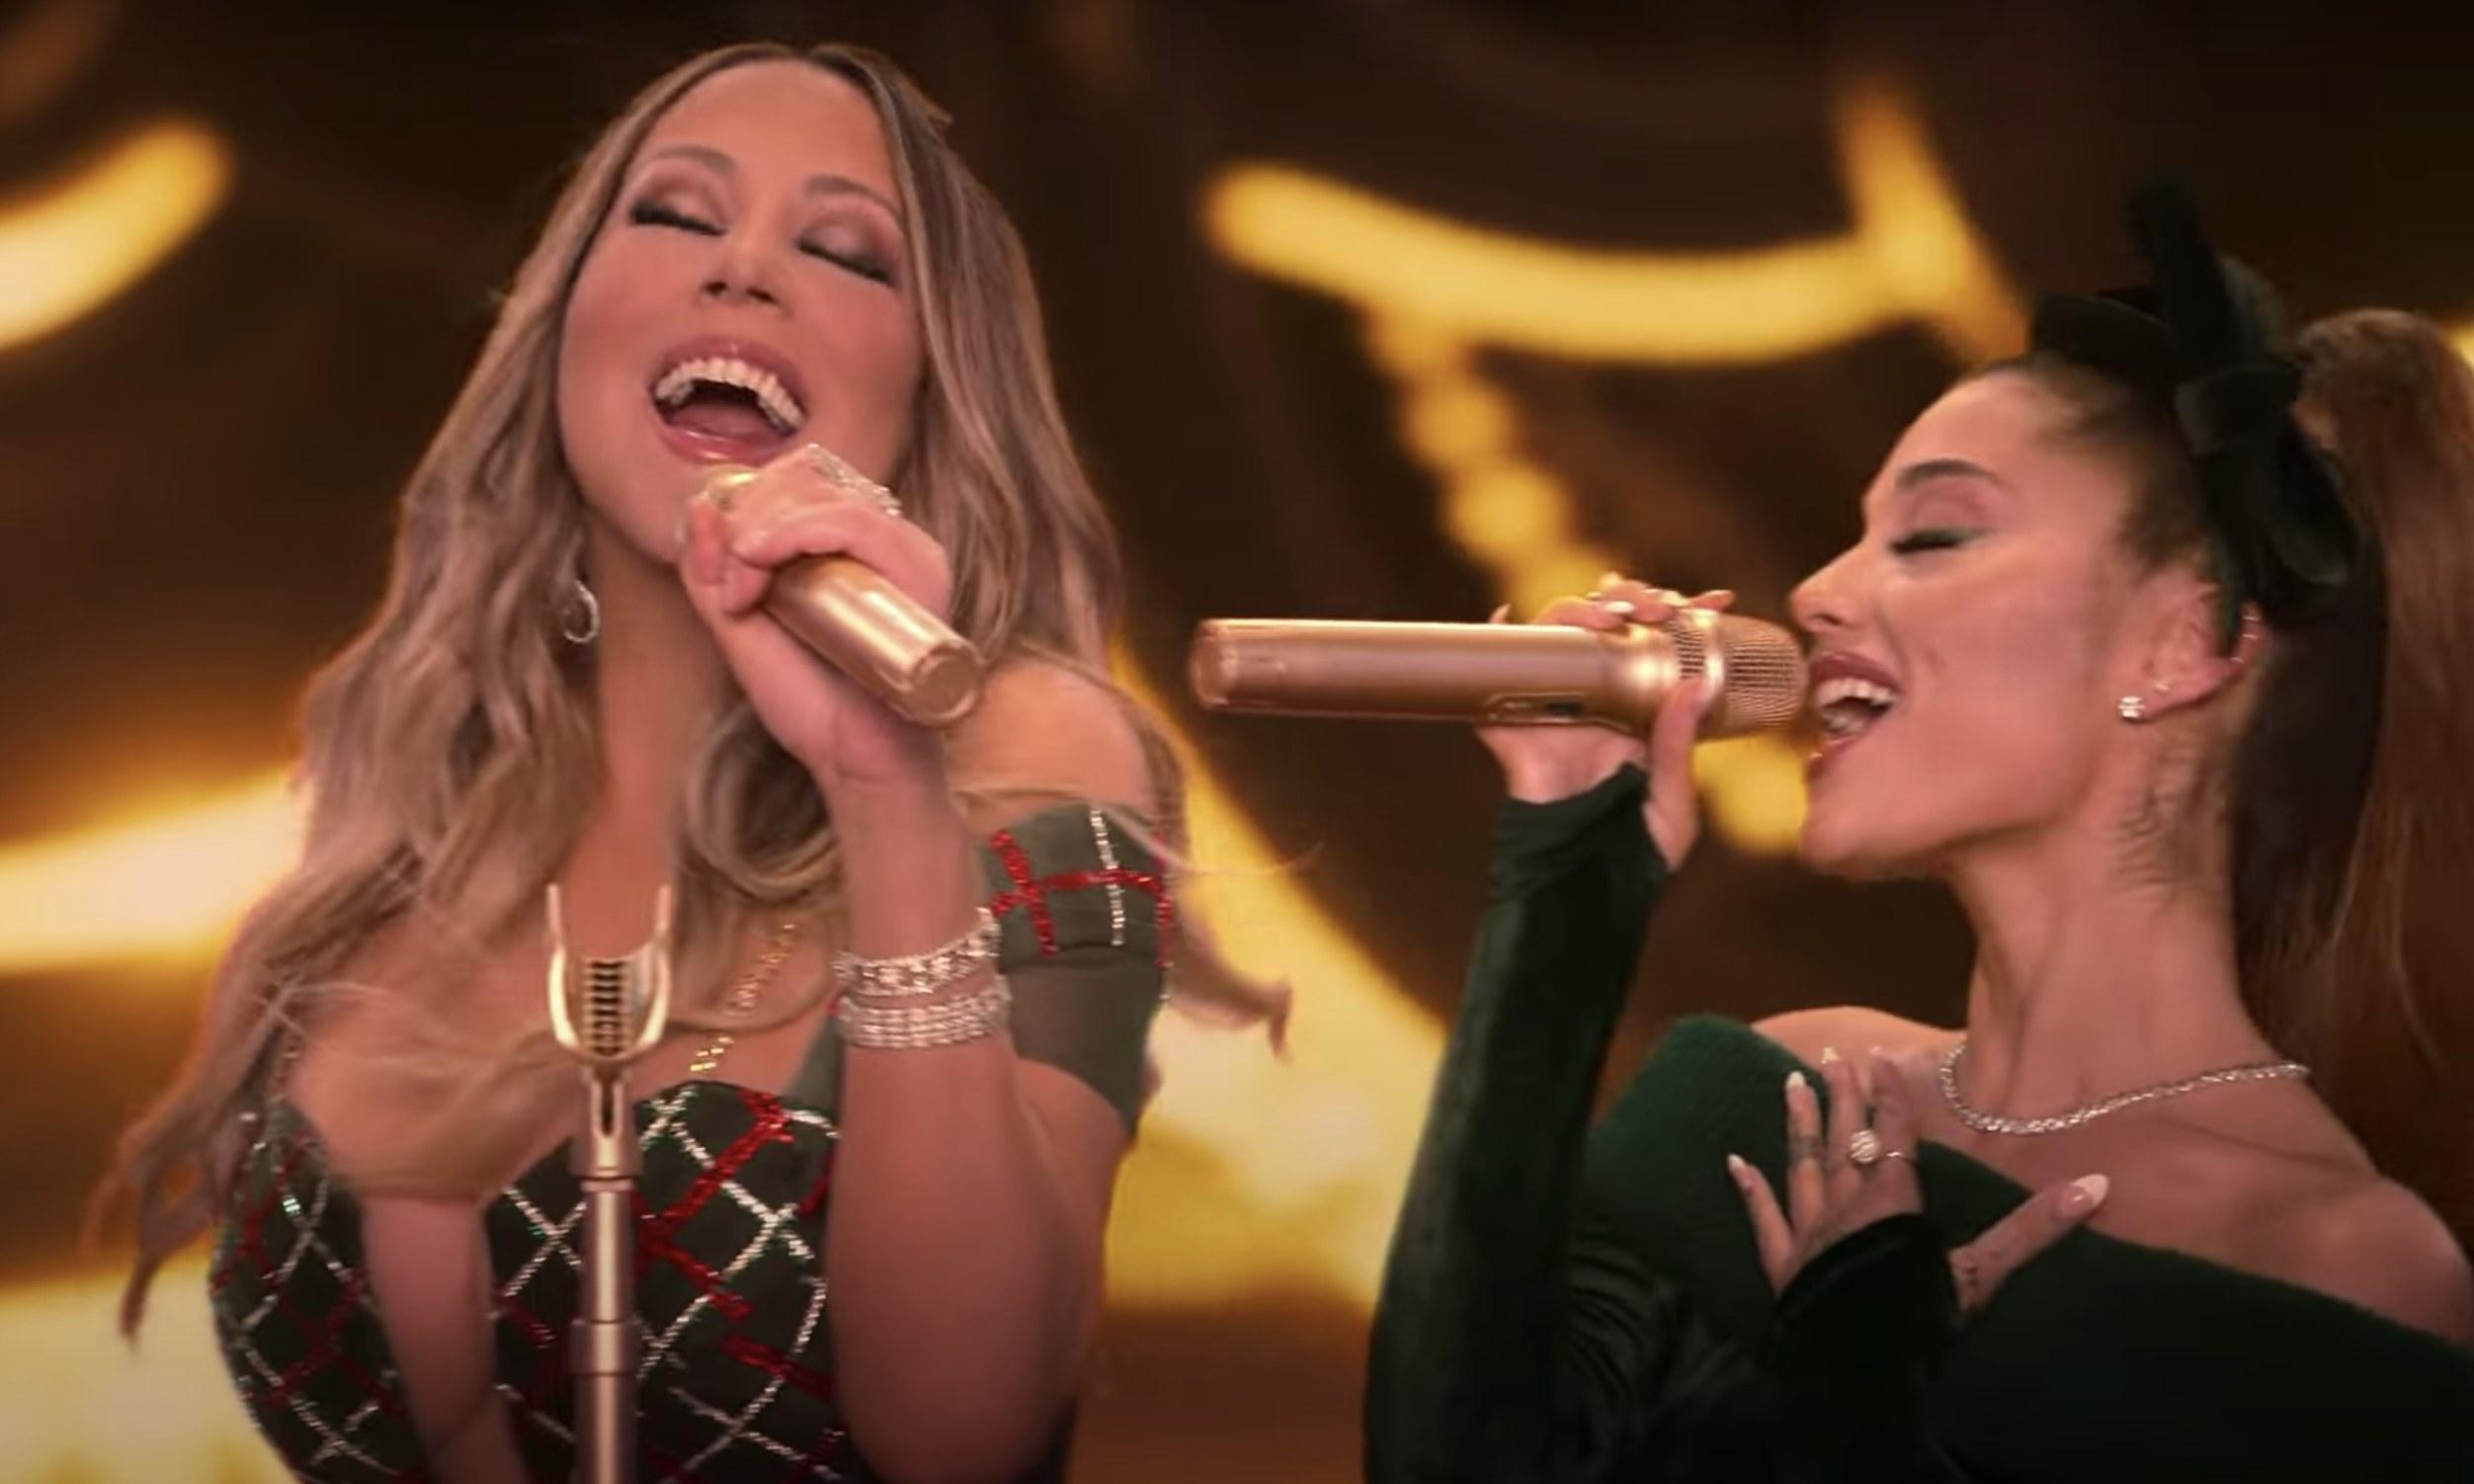 Mariah Carey and Ariana Grande singing